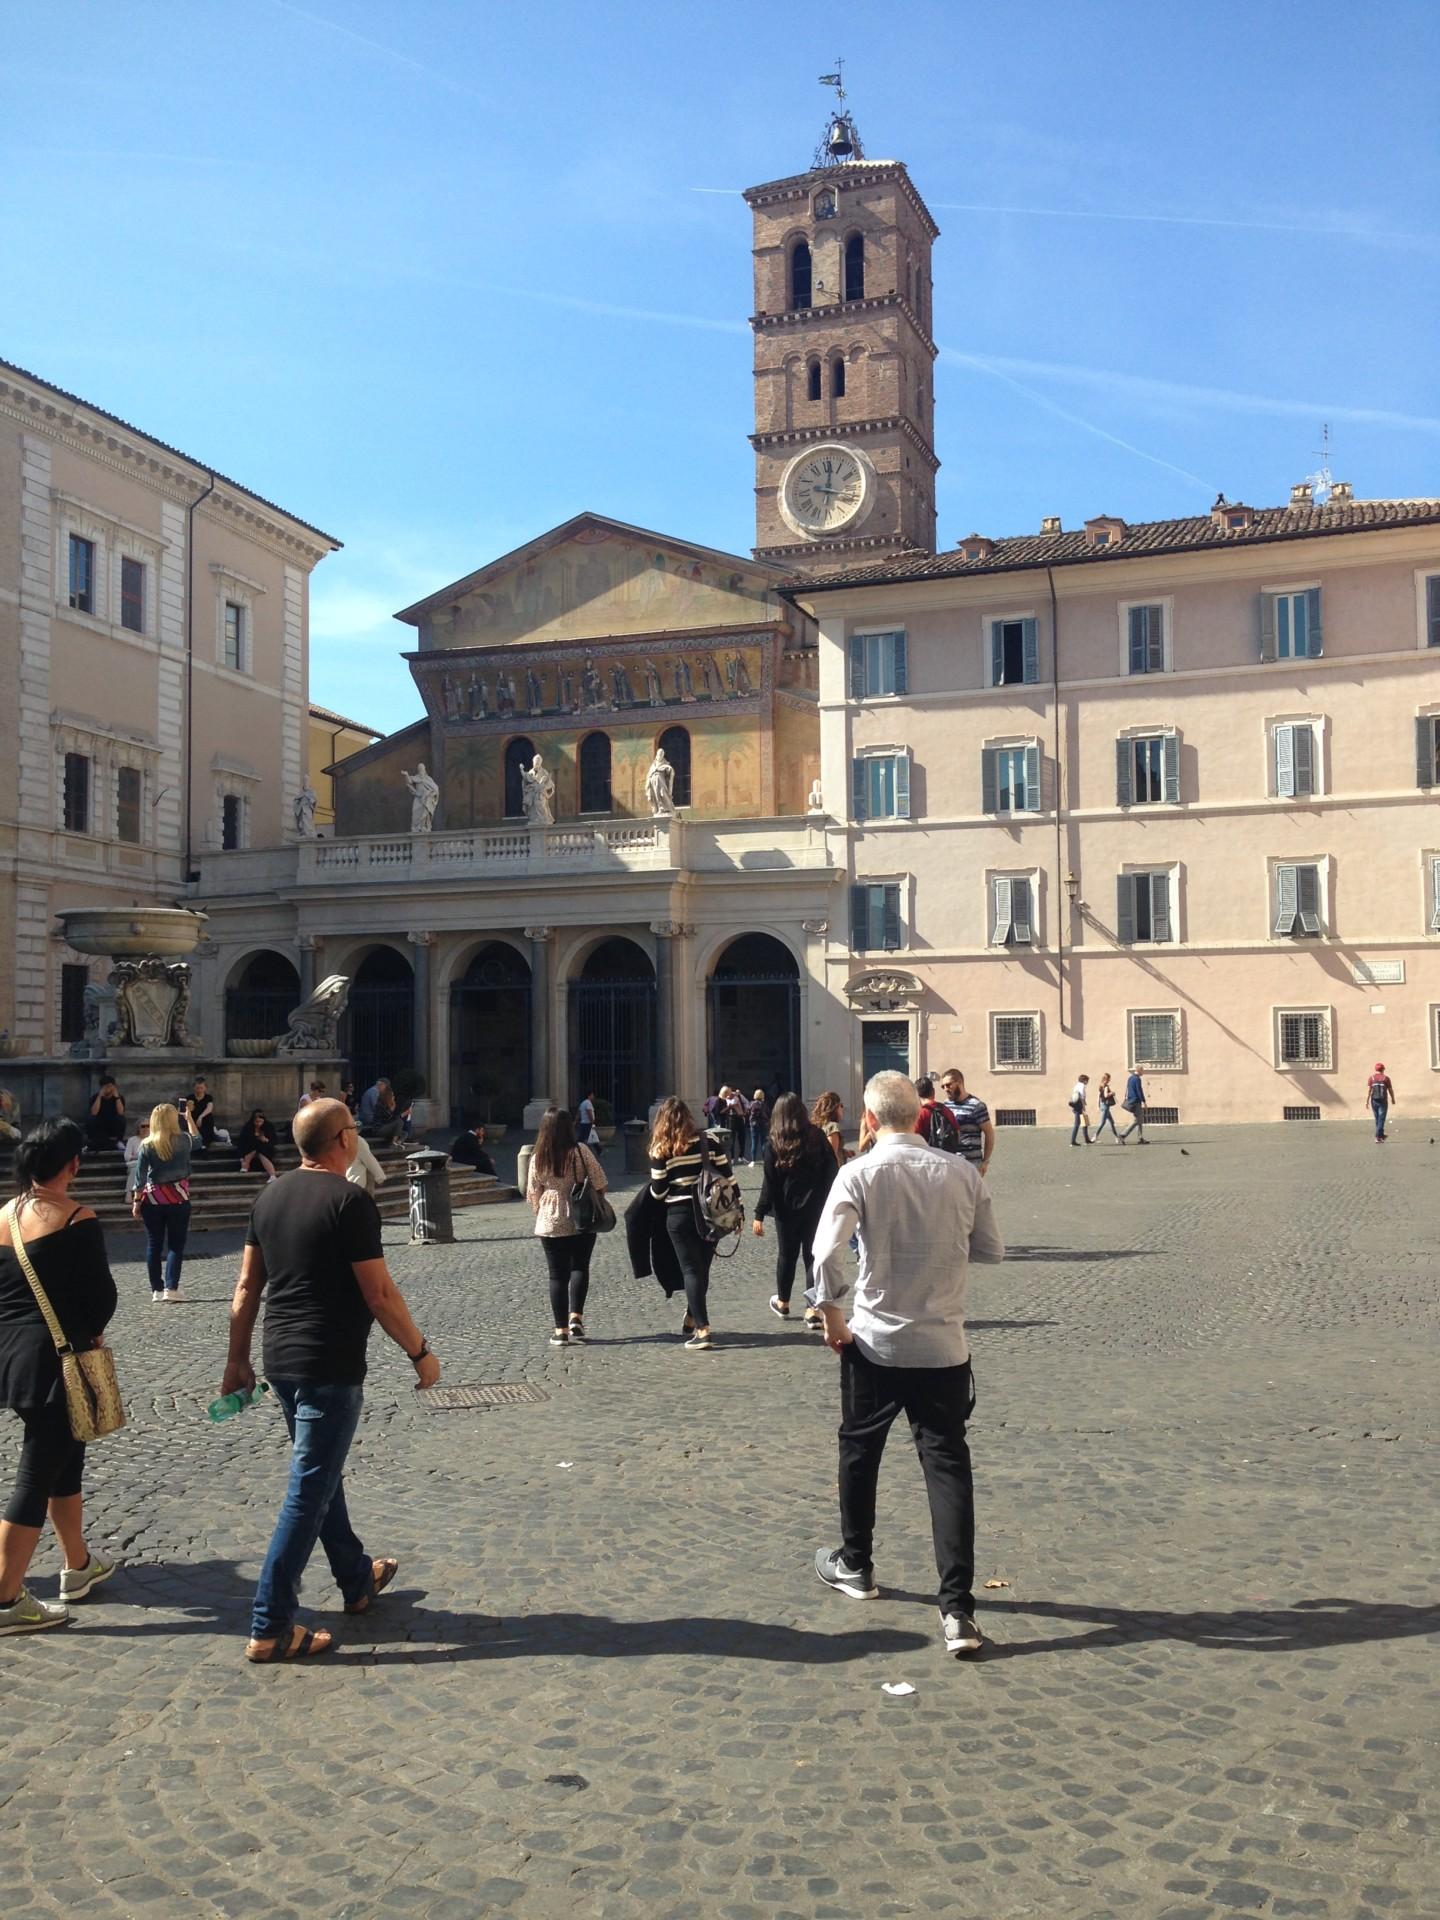 Unterwegs in Rom in italisnisch - Vor Santa Maria in Trastevere